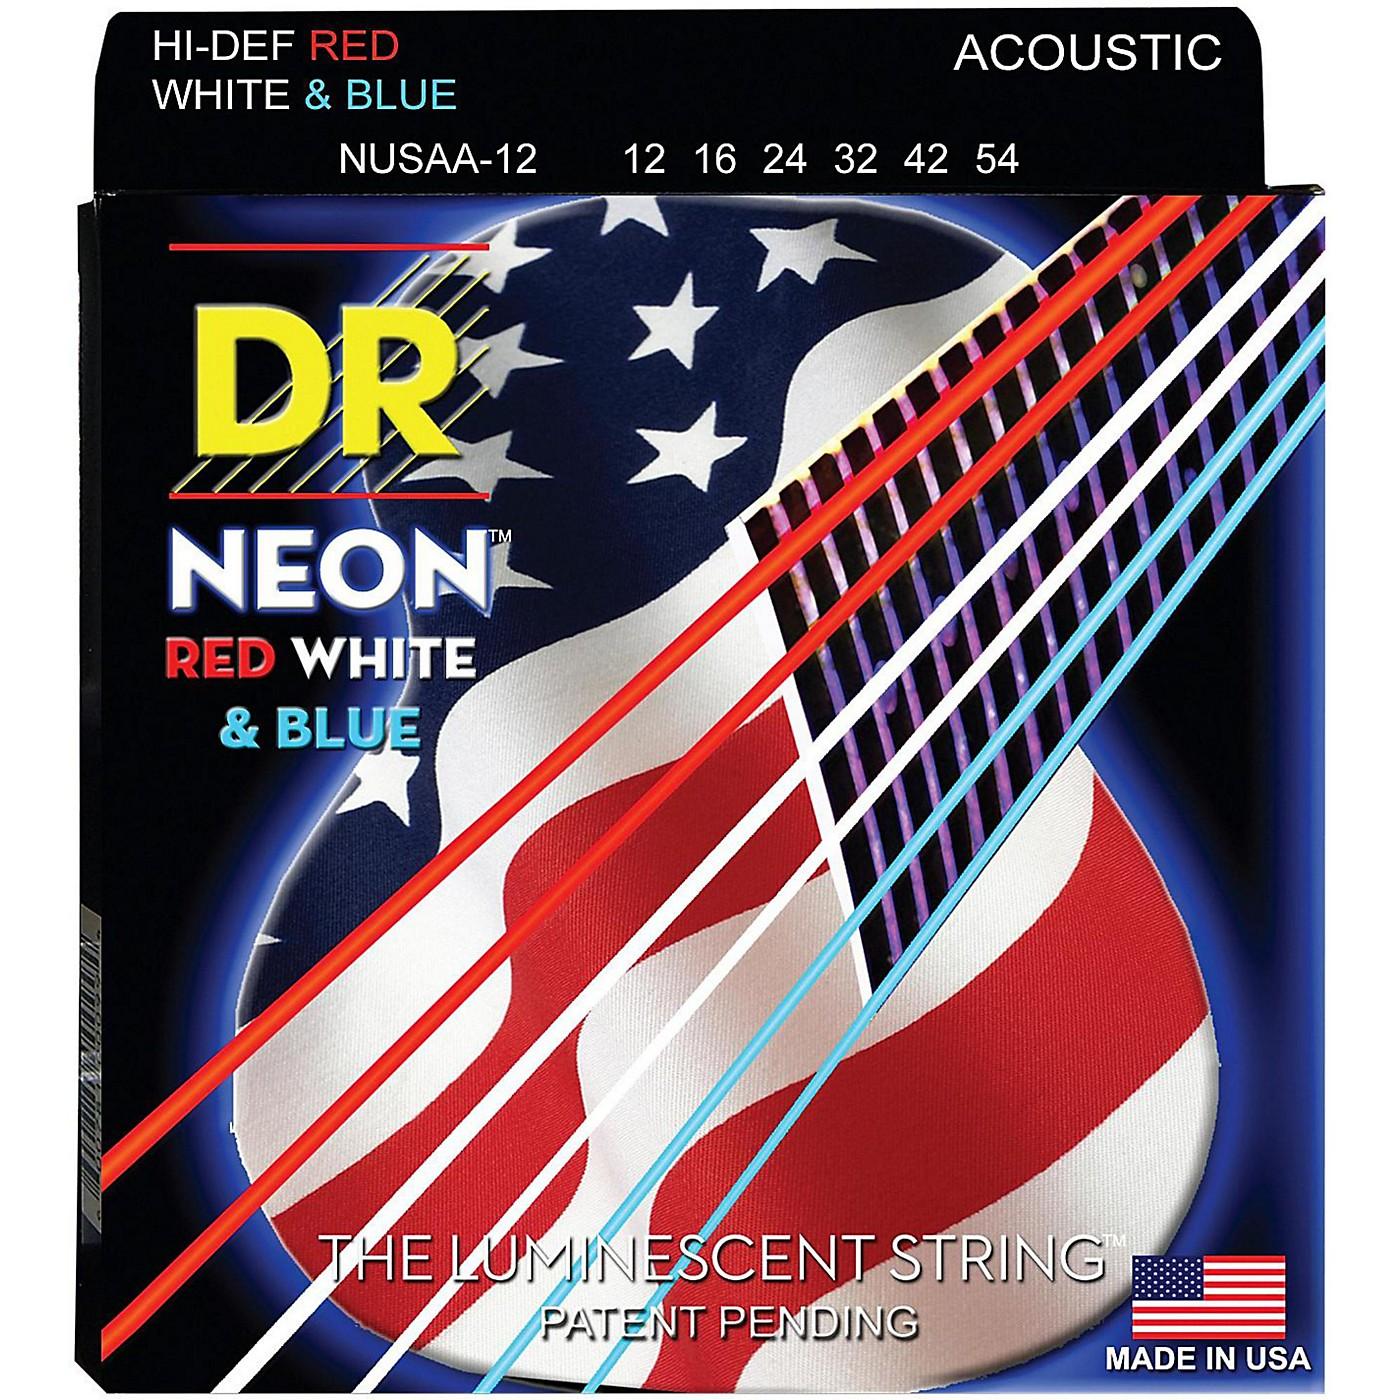 DR Strings Hi-Def NEON Red, White & Blue Acoustic Guitar Medium Strings thumbnail